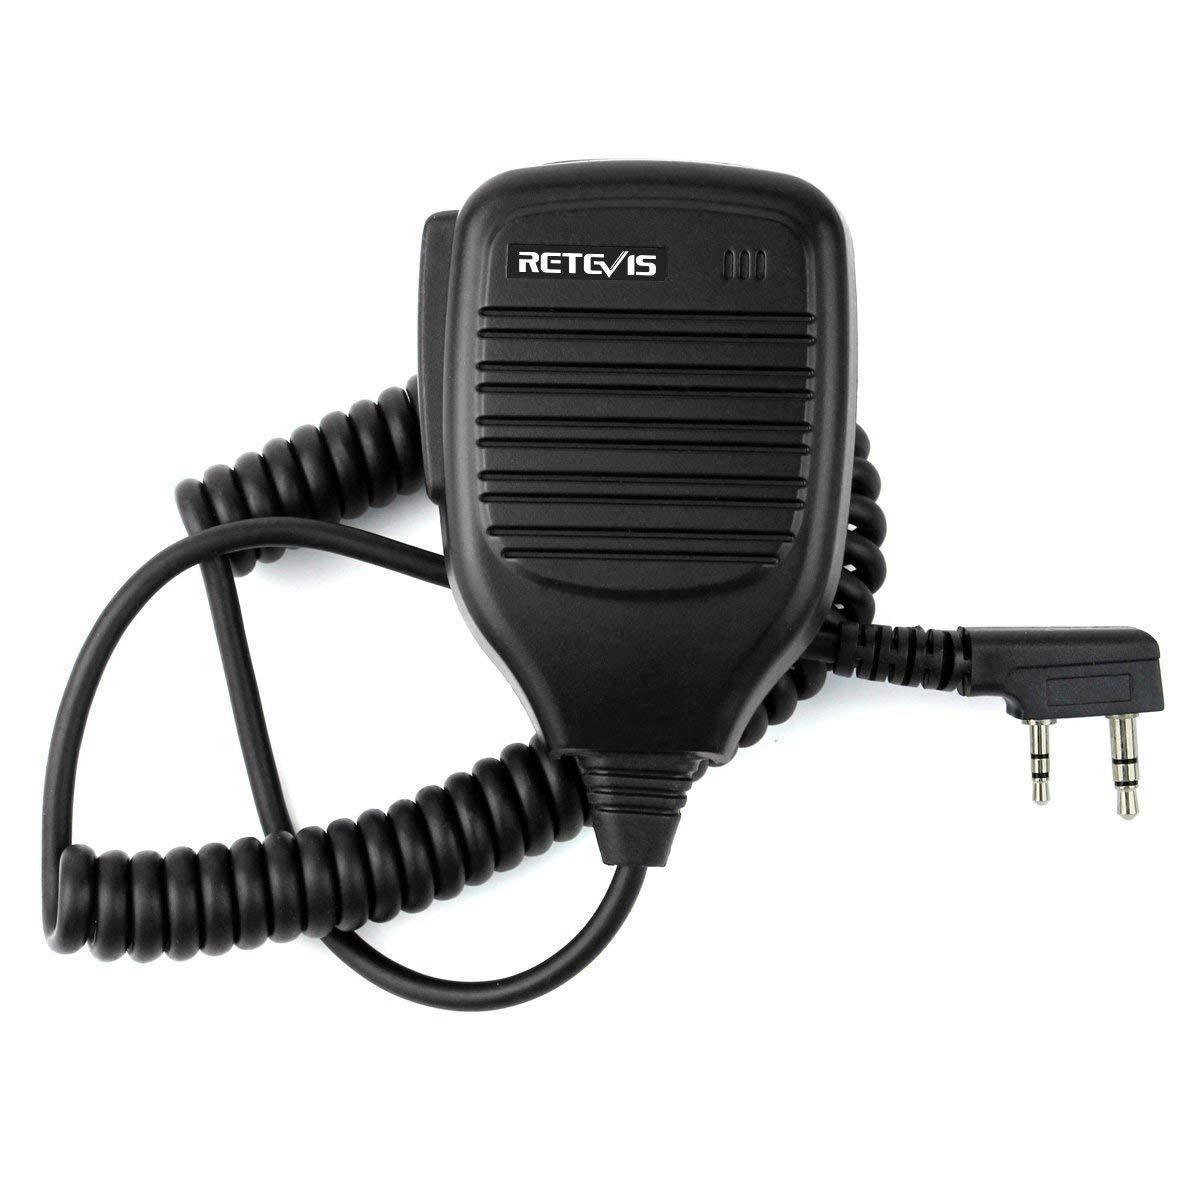 Retevis Shoulder Speaker Mic 2 Pin Two Way Radio Micphone for Baofeng UV-5R UV-82 888S Retevis H-777 RT21 RT22 RT27 Arcshell AR-5 2 Way Radio(1 Pack)